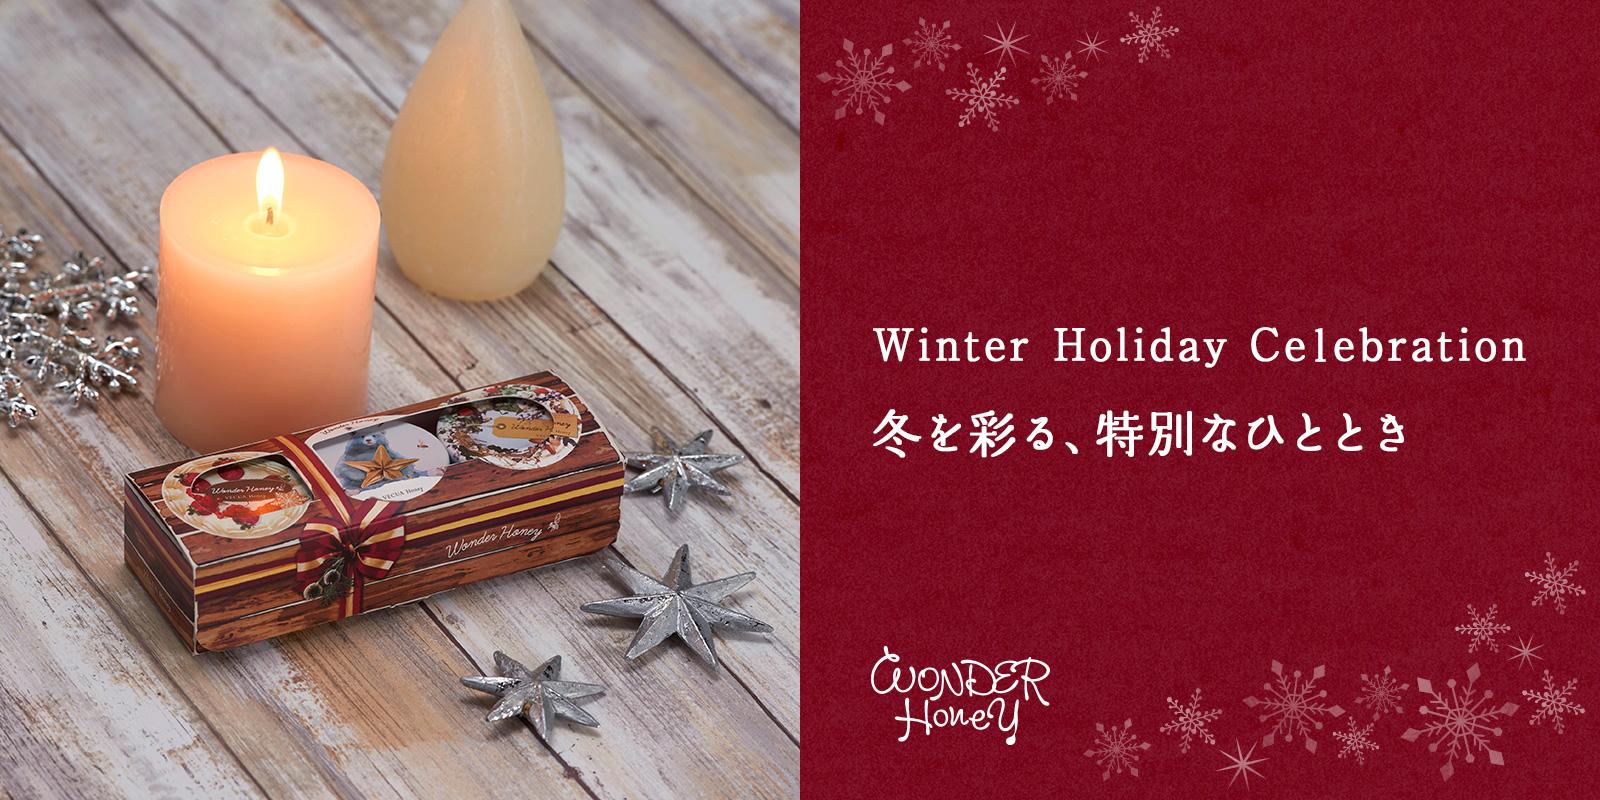 Winter Holiday Celebration 冬を彩る、特別なひととき